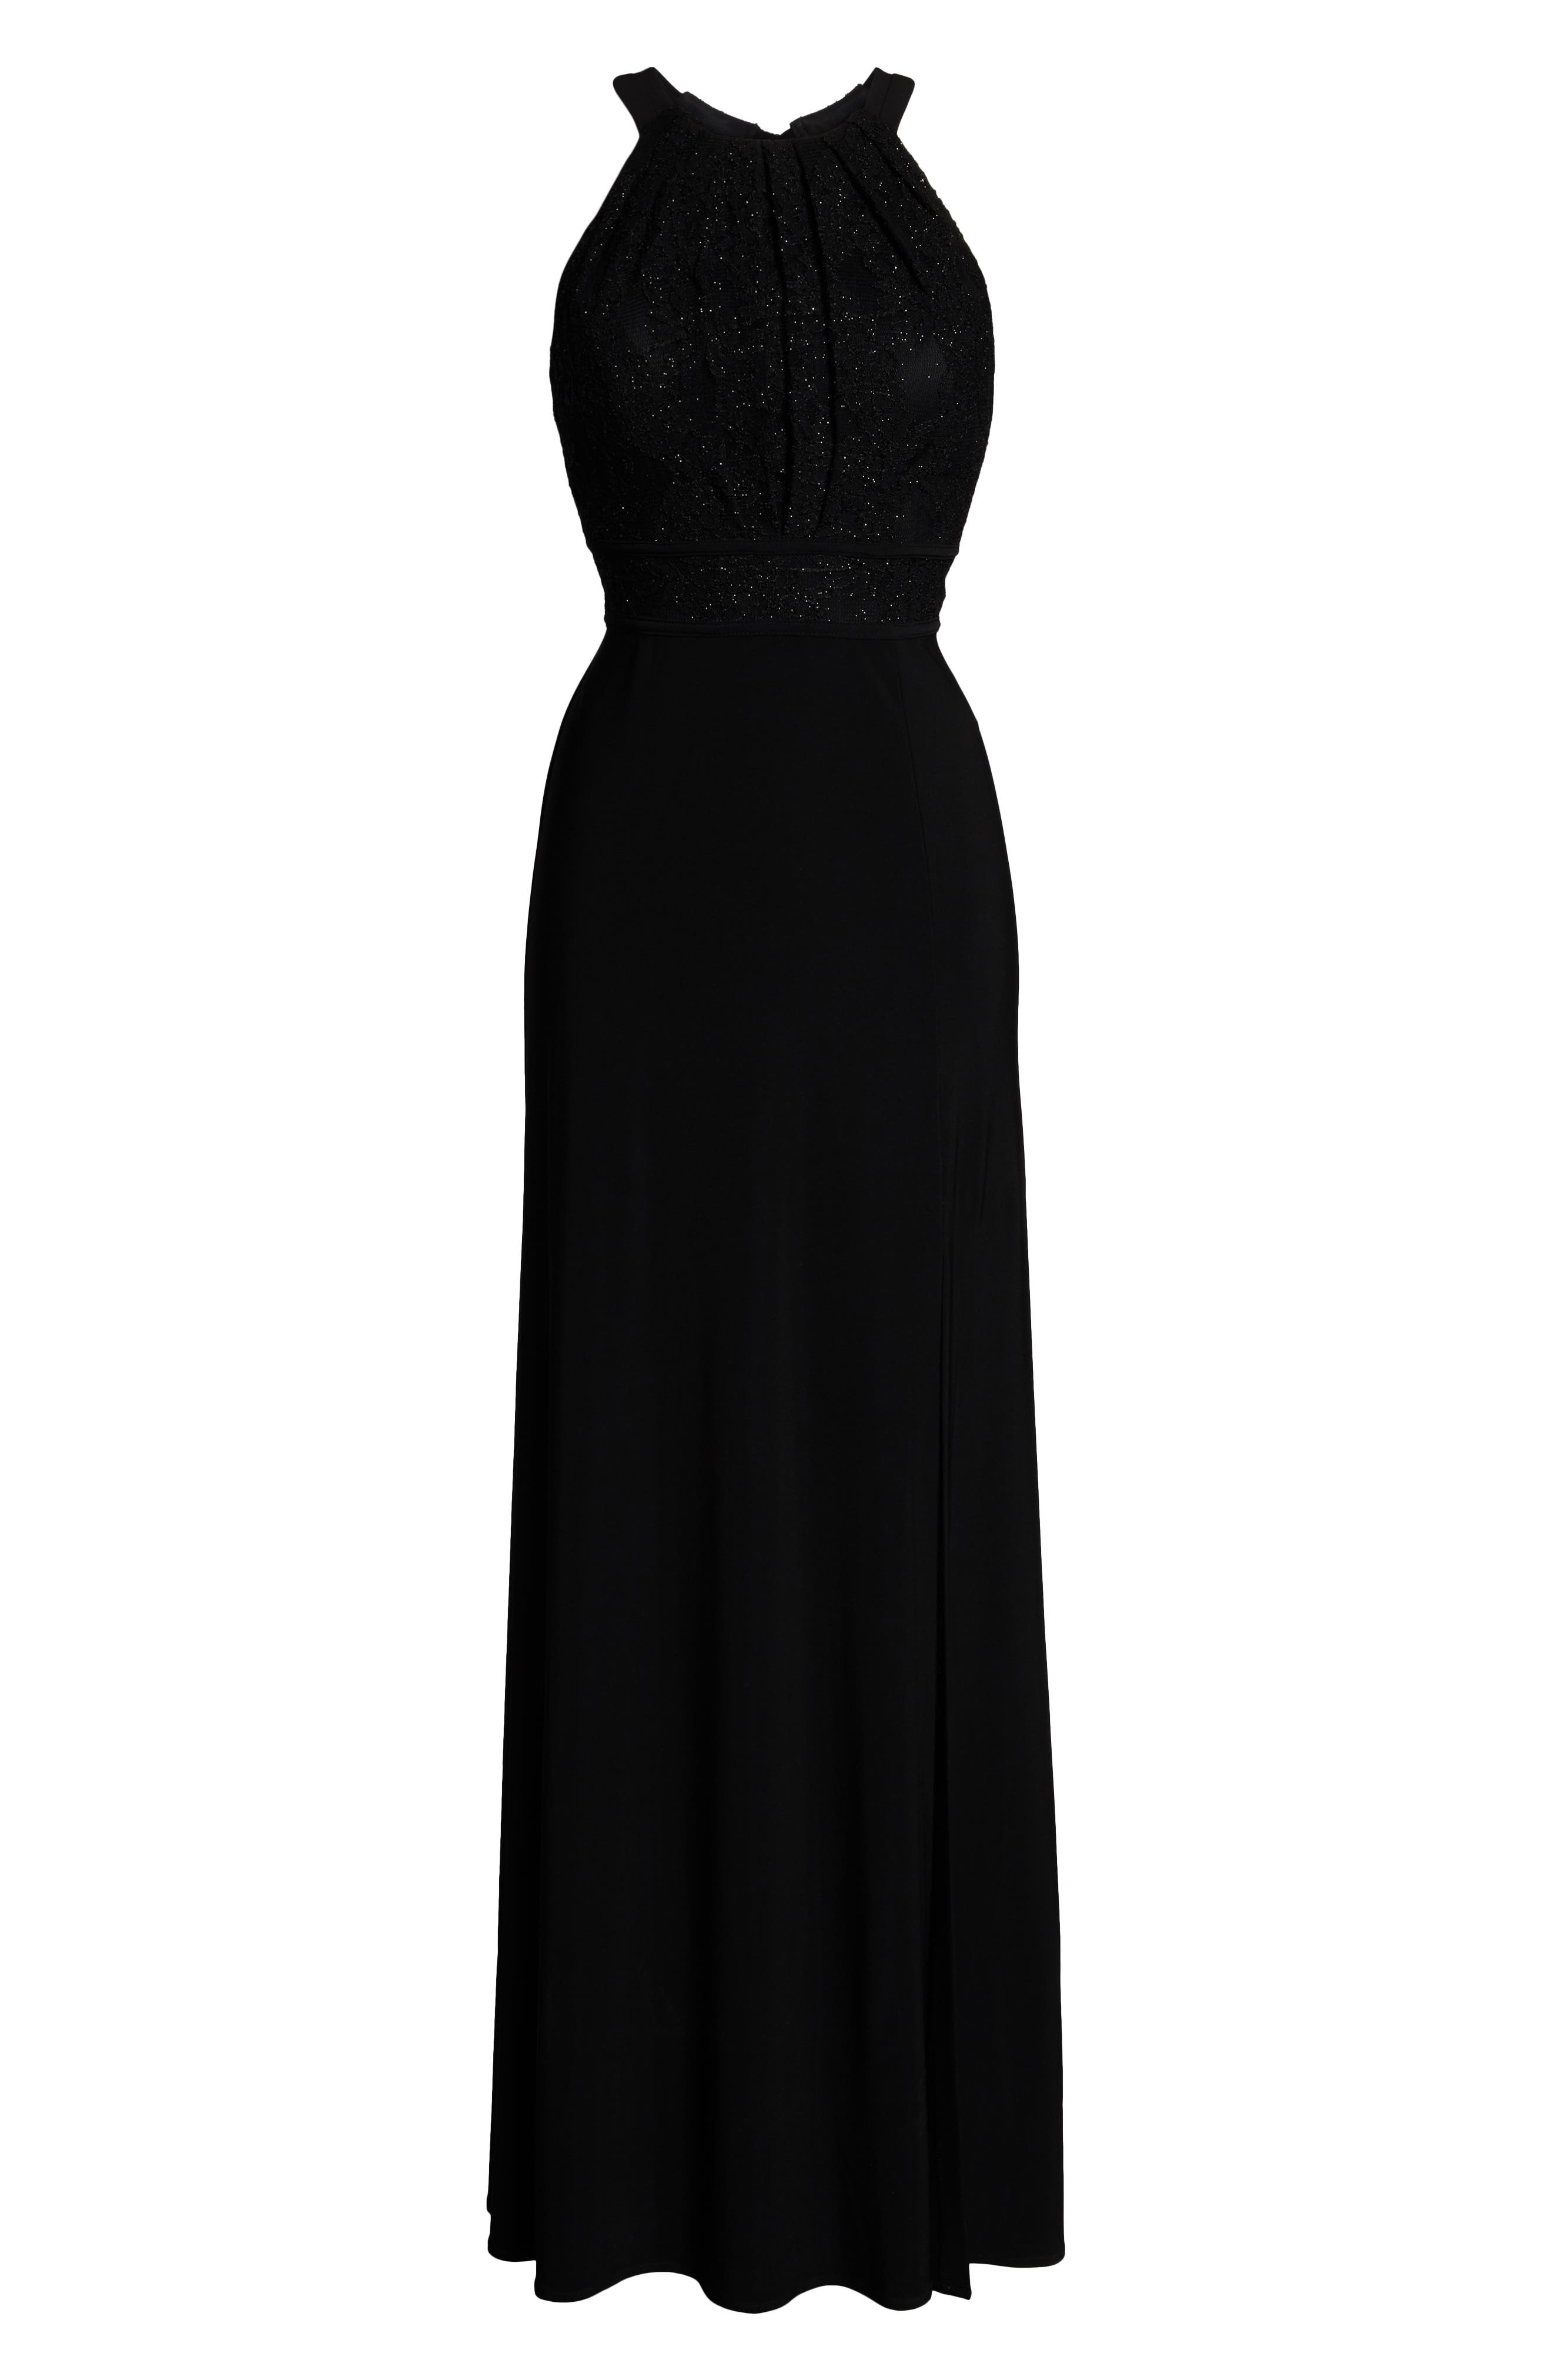 MORGAN & CO.,                             Pleat Lace Bodice Evening Dress,                             Alternate thumbnail 7, color,                             BLACK